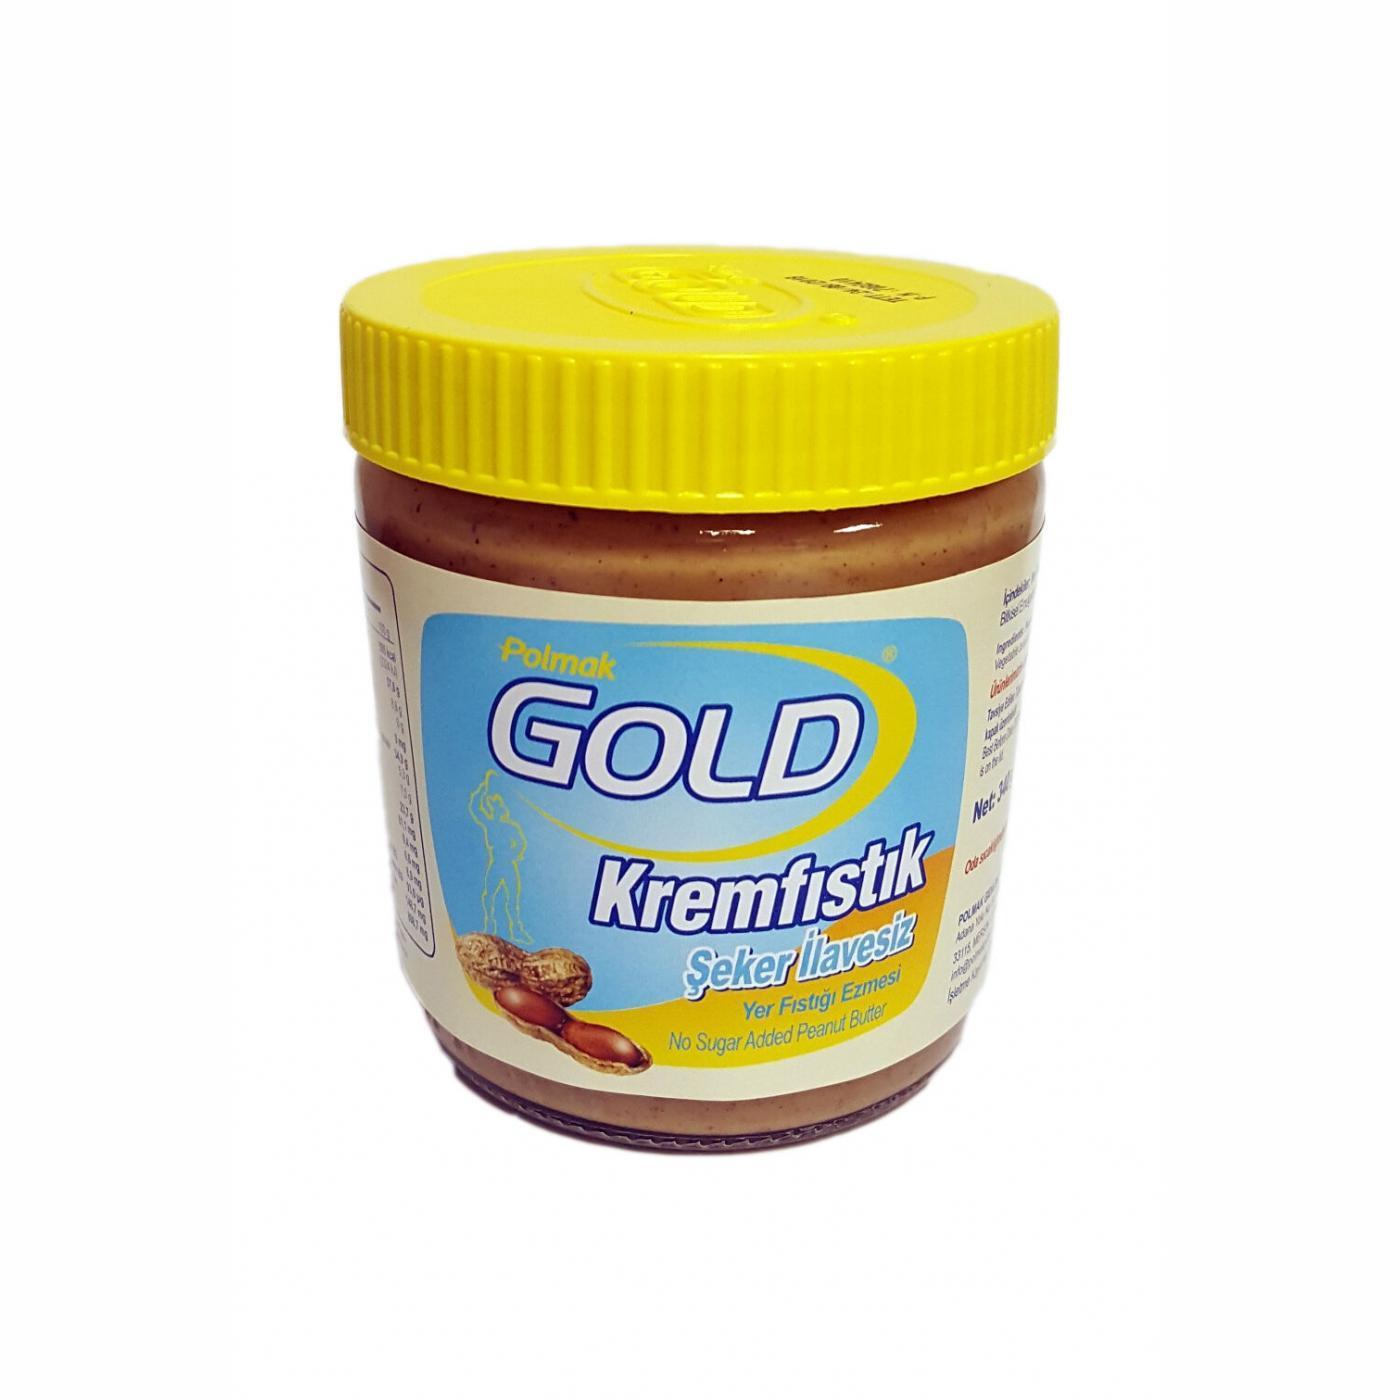 GOLD 340GR KREM FISTIK ŞEKER İLAVESİZ